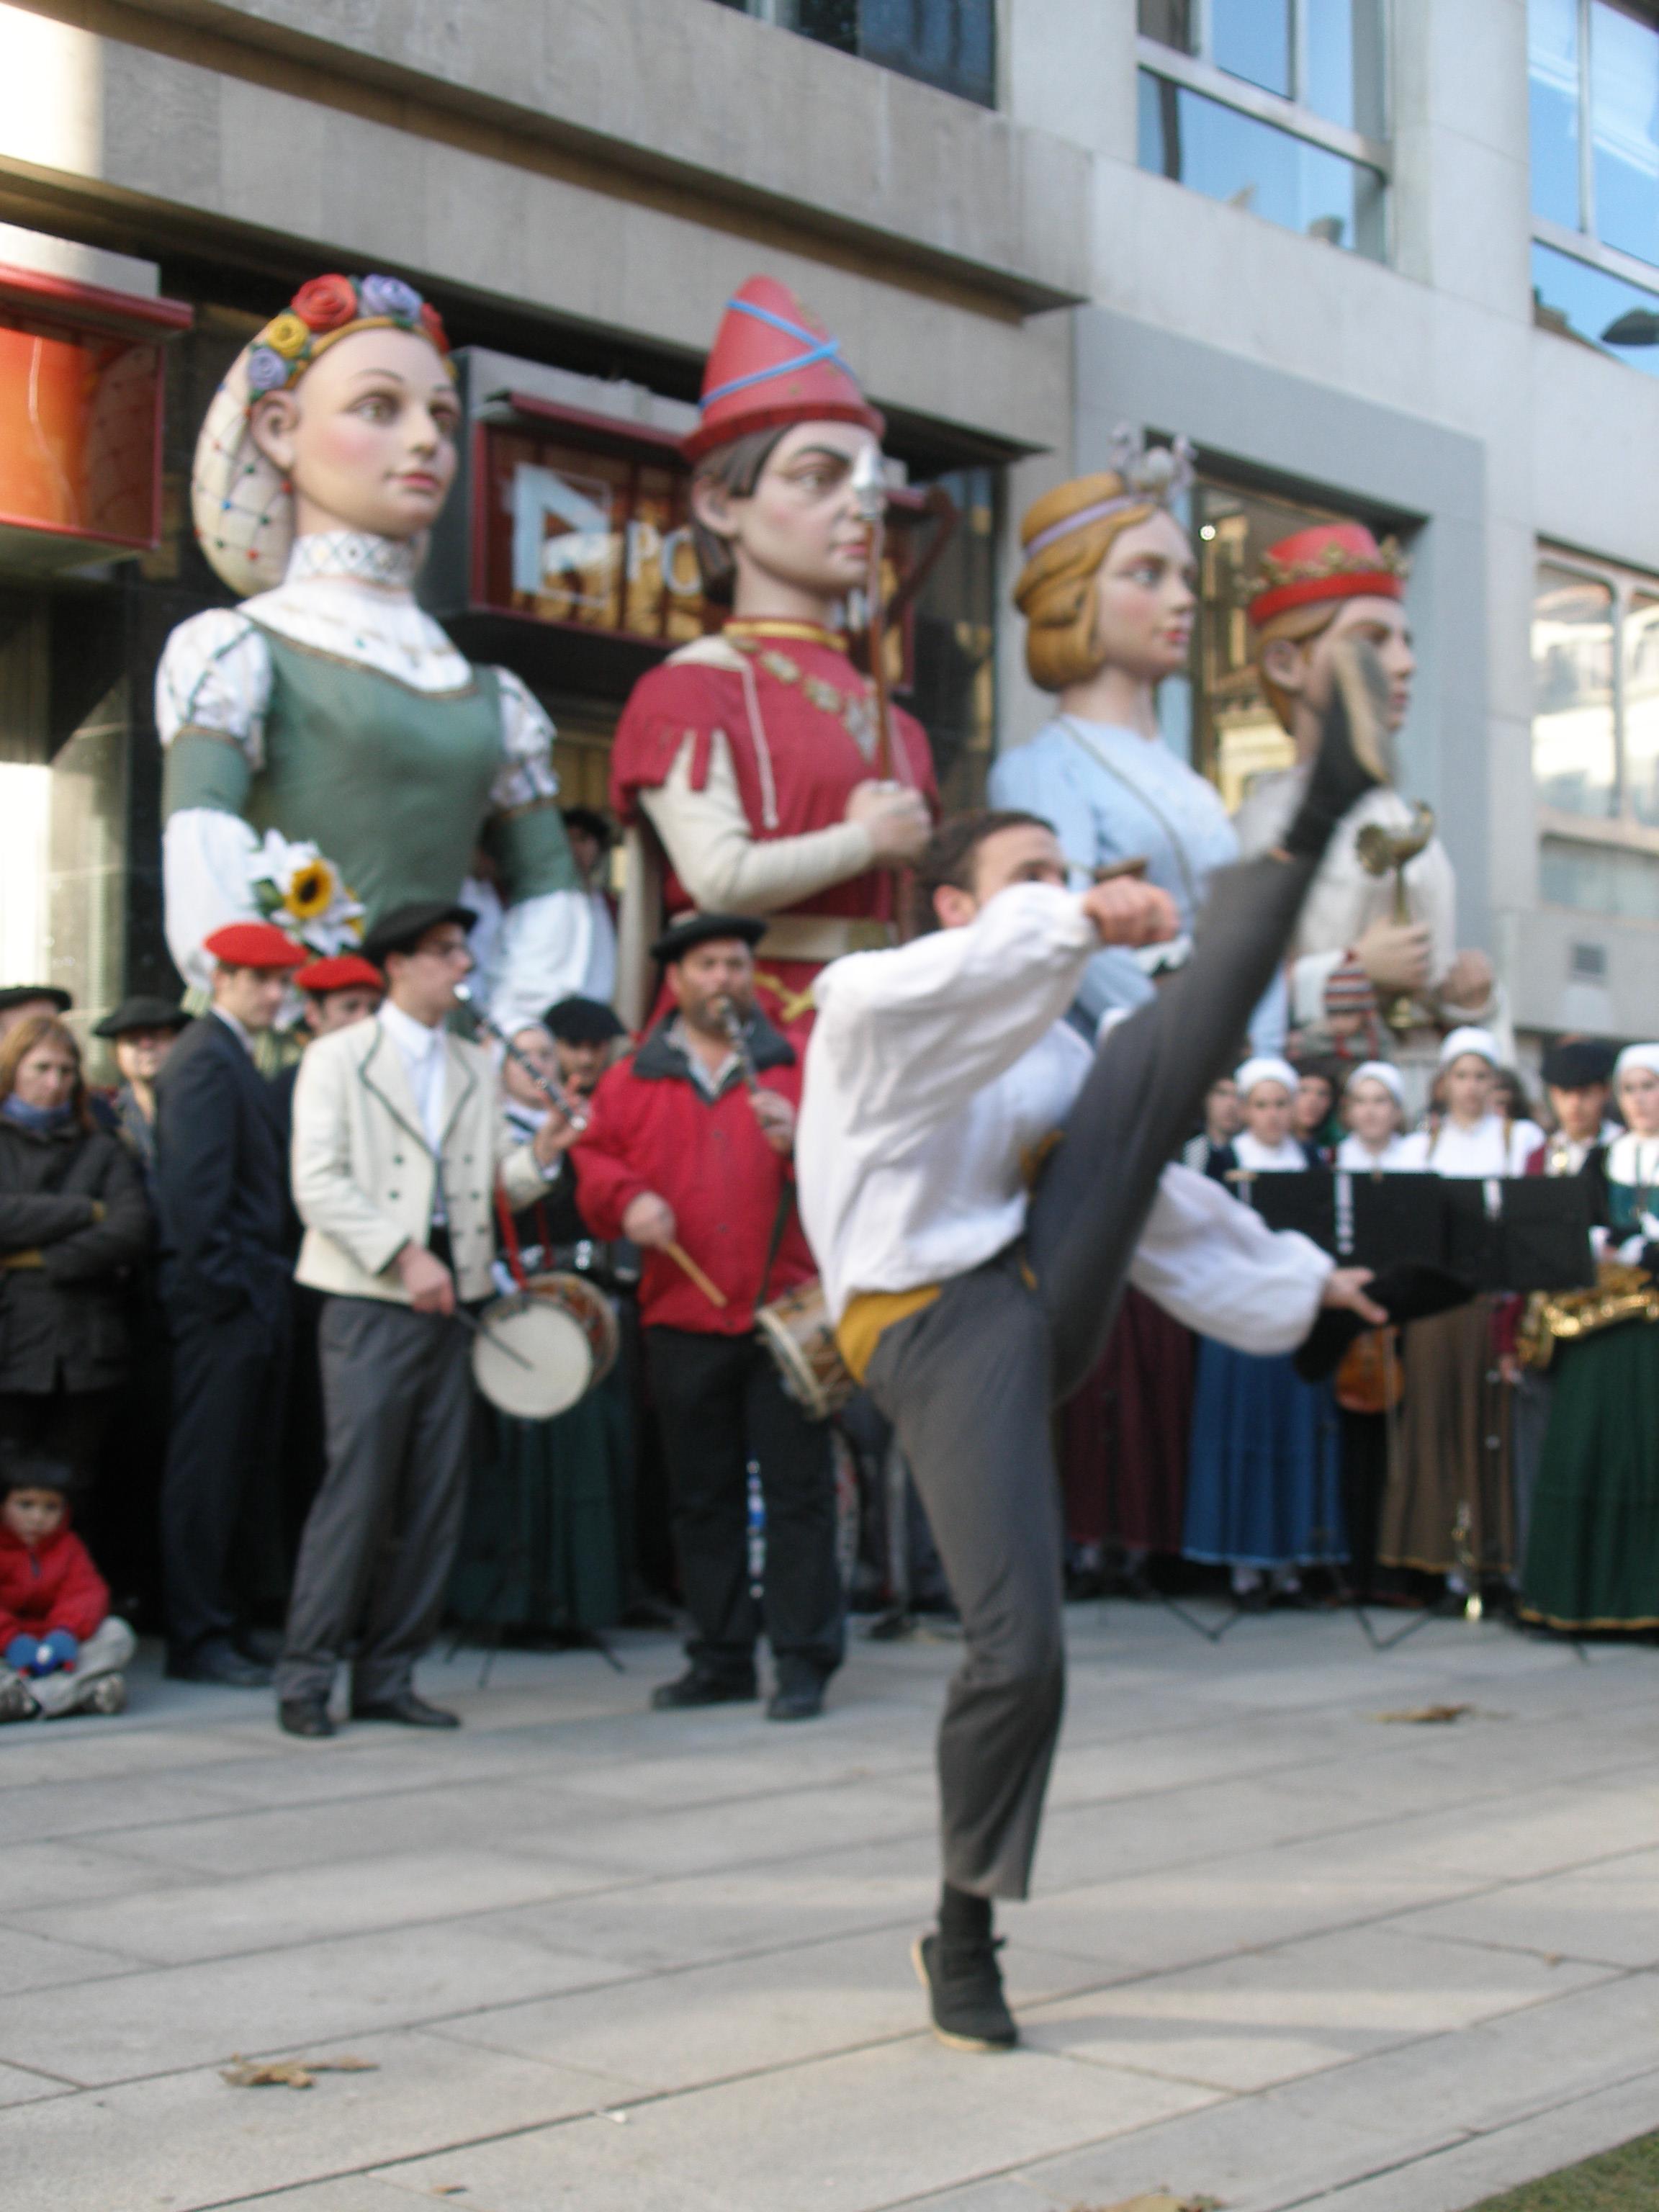 Aurresku Congreso Bilbao on Vimeo